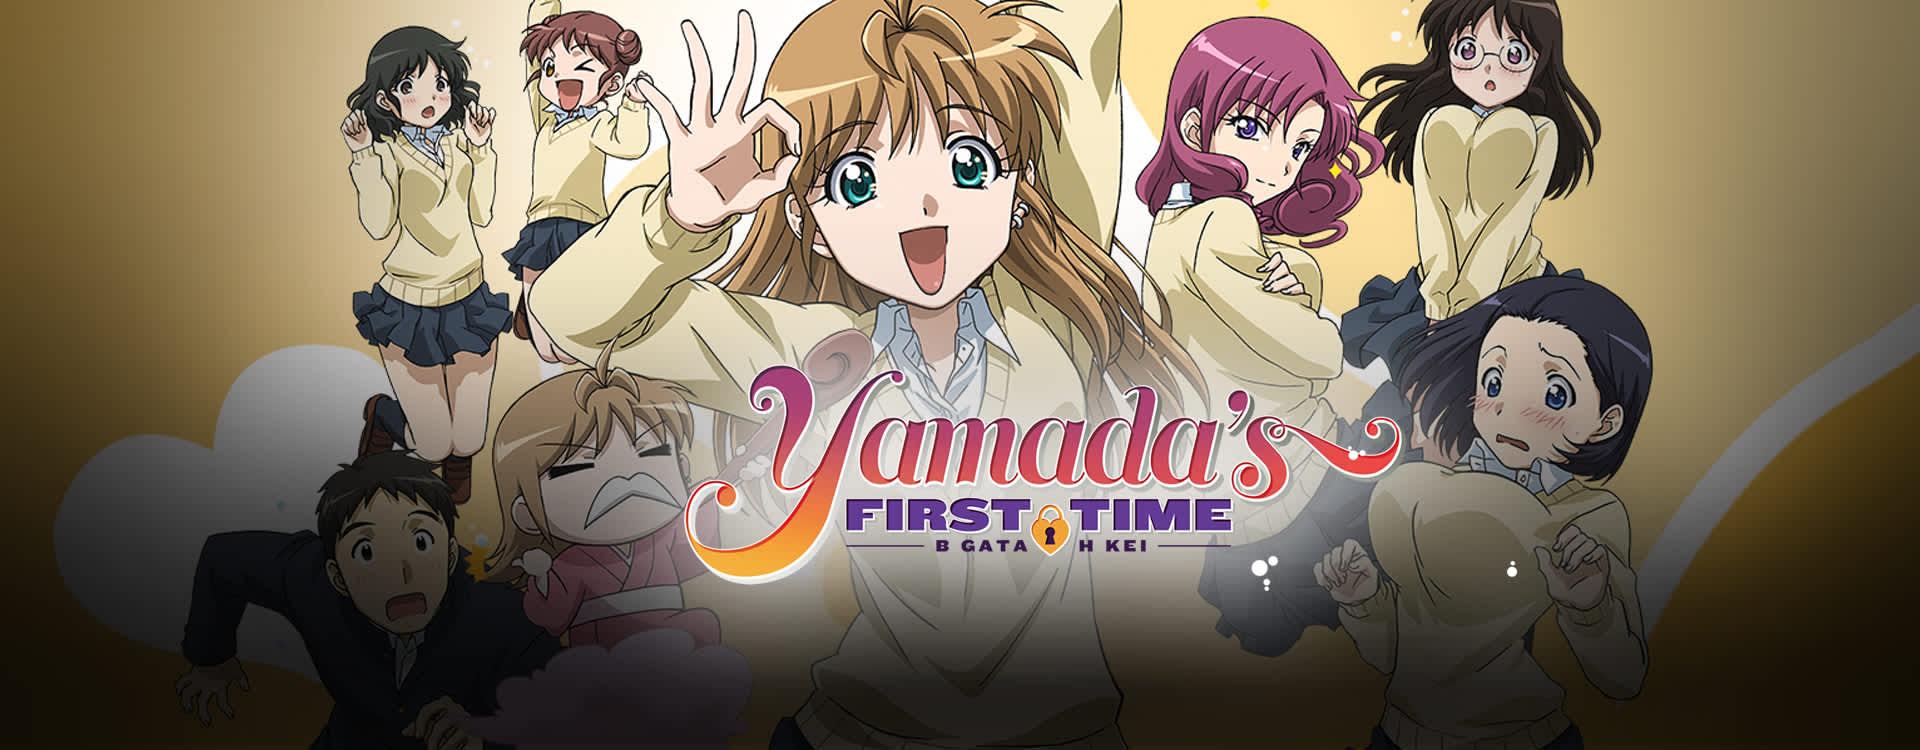 Watch Yamada's First Time: B Gata H Kei Episodes Sub & Dub | Comedy